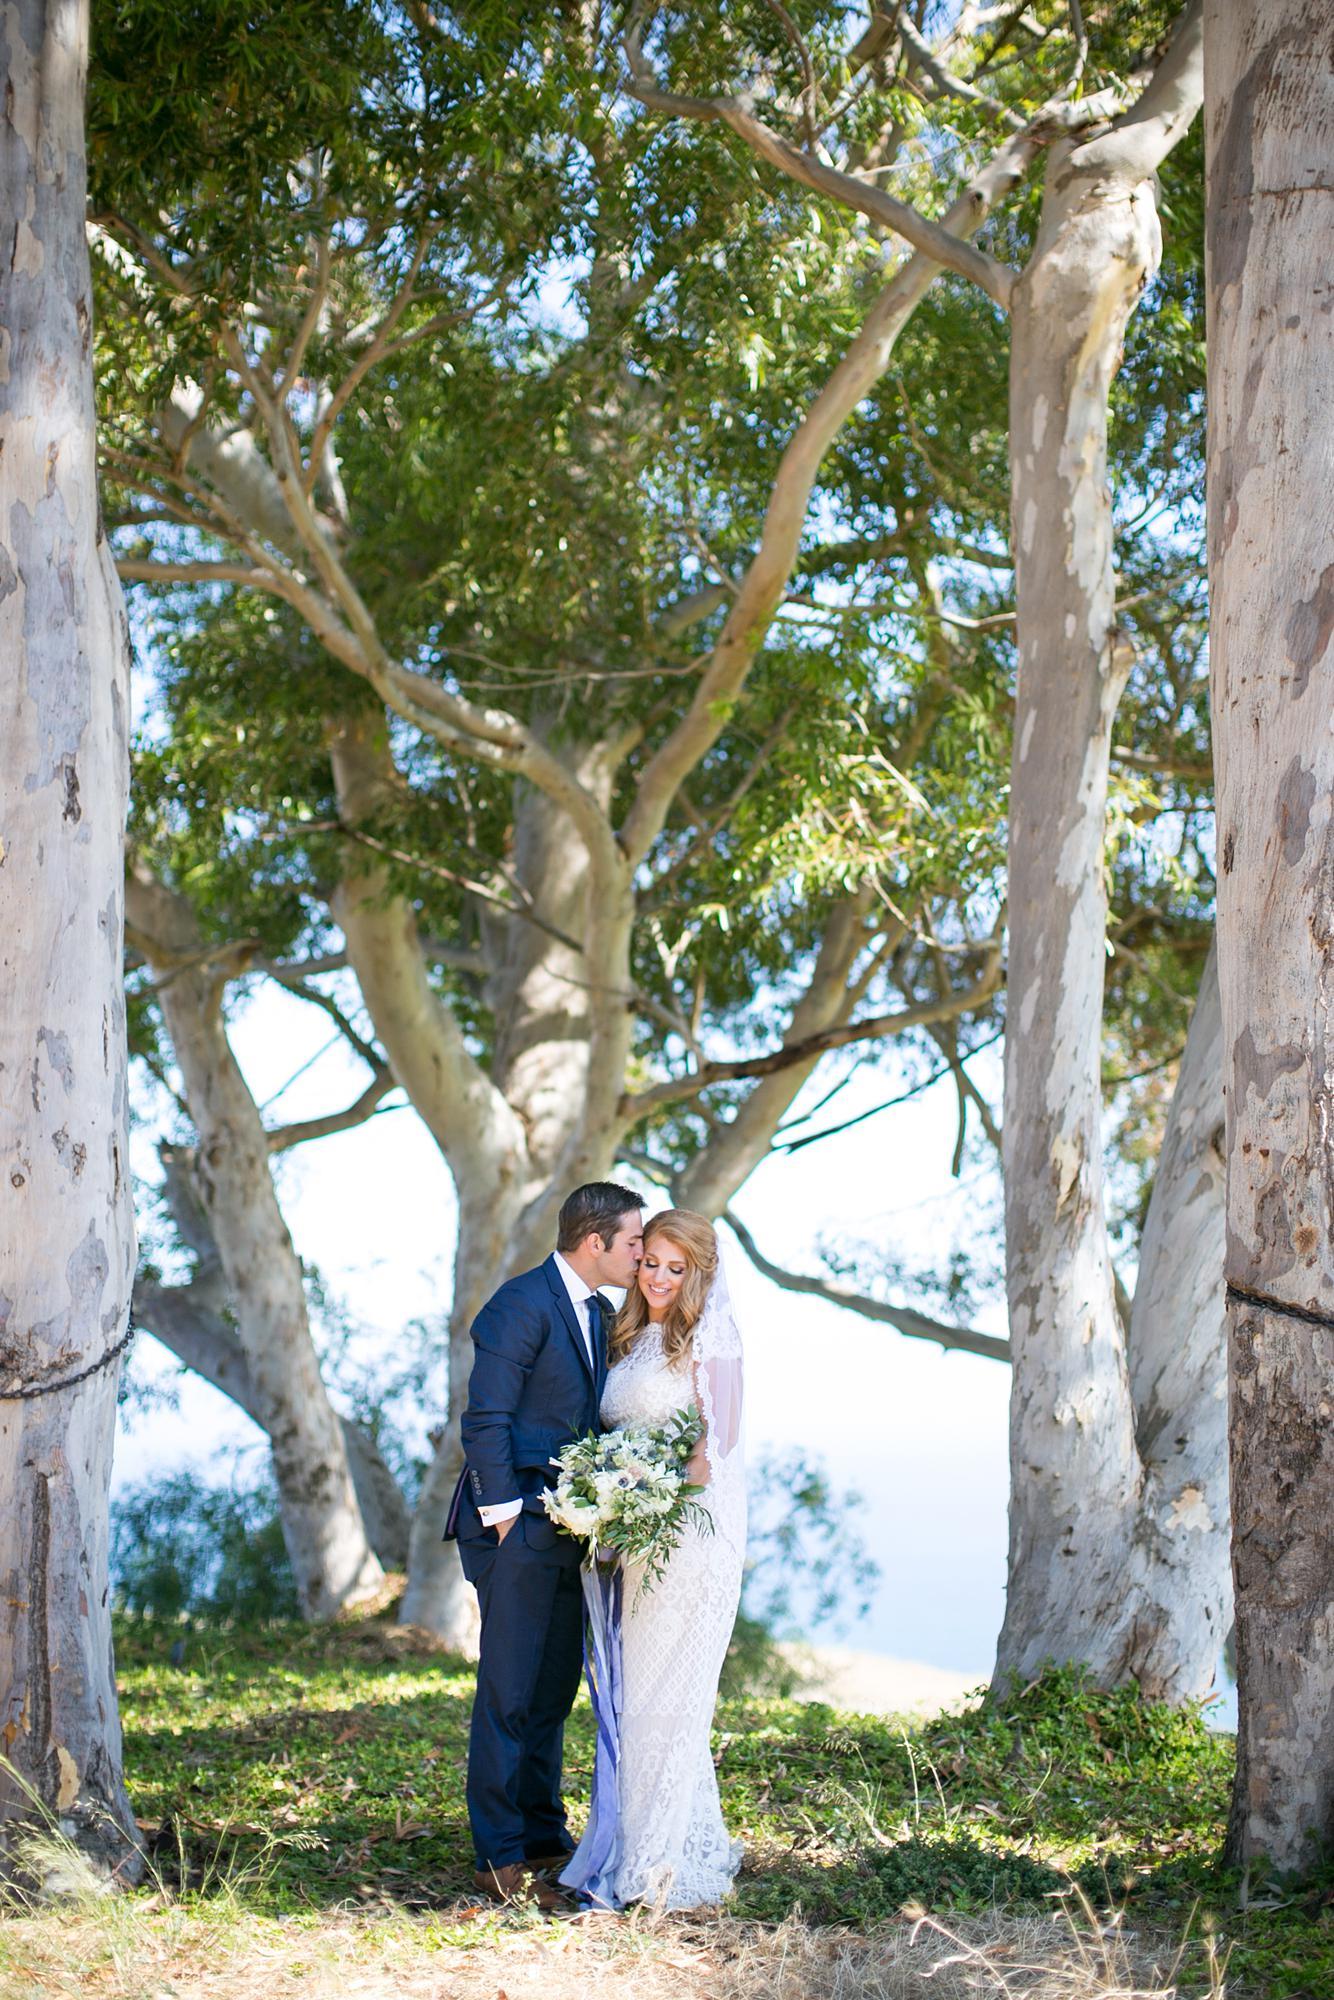 Catalina View Gardens Wedding | Miki & Sonja Photography | mikiandsonja.com